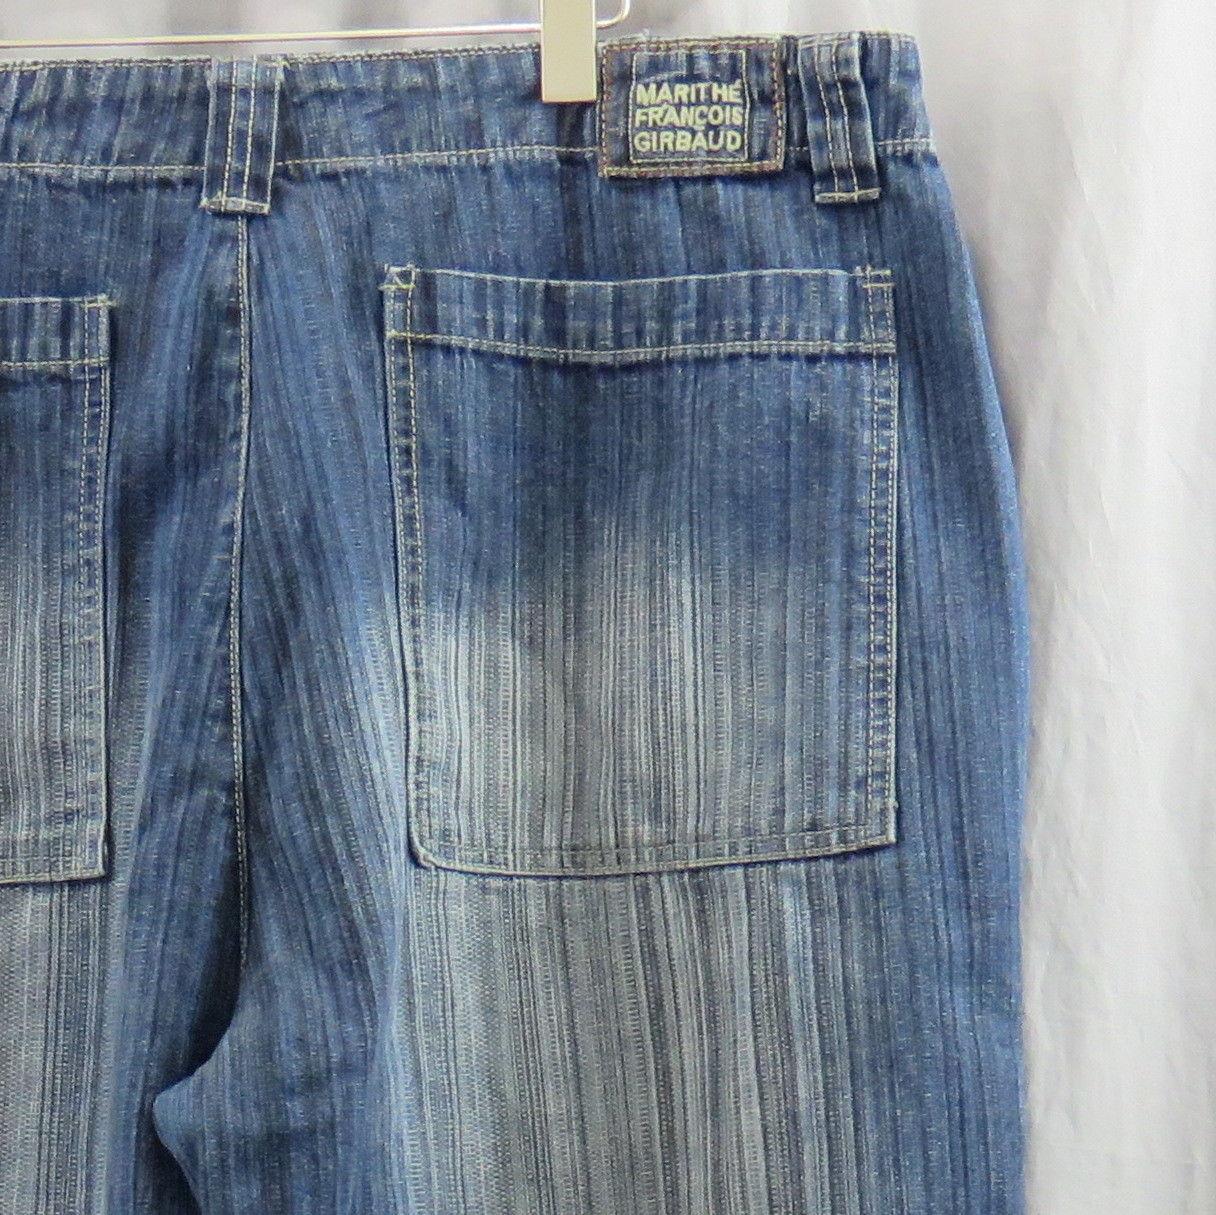 b8e36bda Marithe Francois Girbaud Blue Jeans 40x34 And 50 Similar Items. Vtg 90s  Marithe Francois Girbaud Mens 38 Graffiti Spellout ...